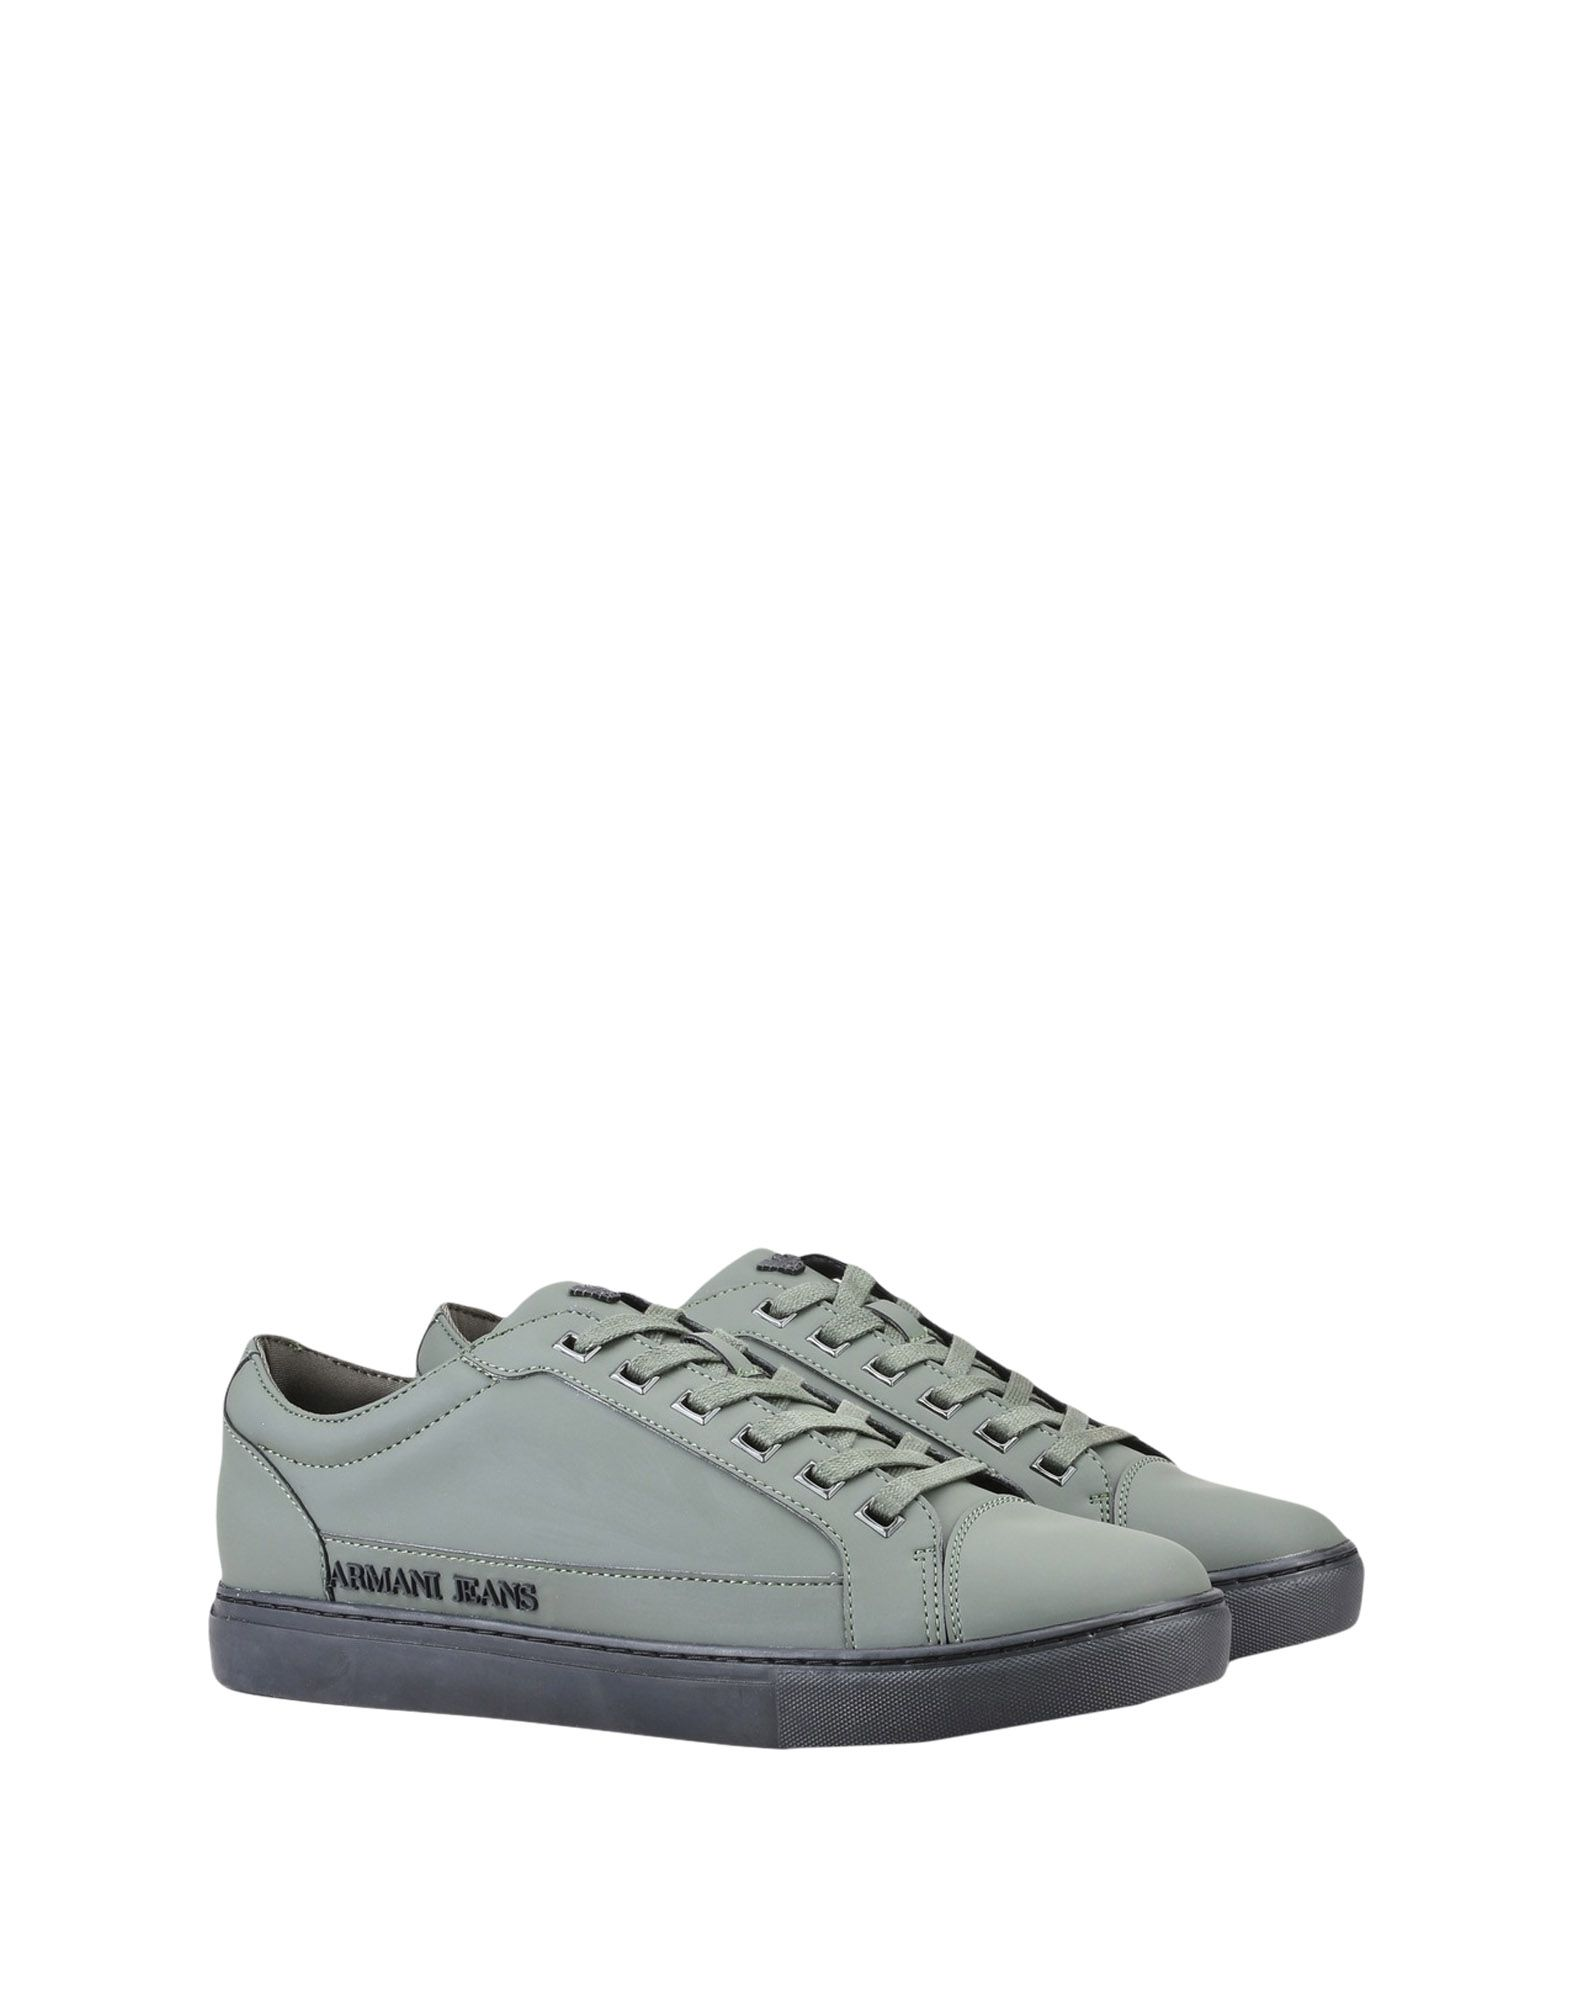 Armani Armani Jeans Sneakers - Men Armani Armani Jeans Sneakers online on  Canada - 11562205BX 5bc592